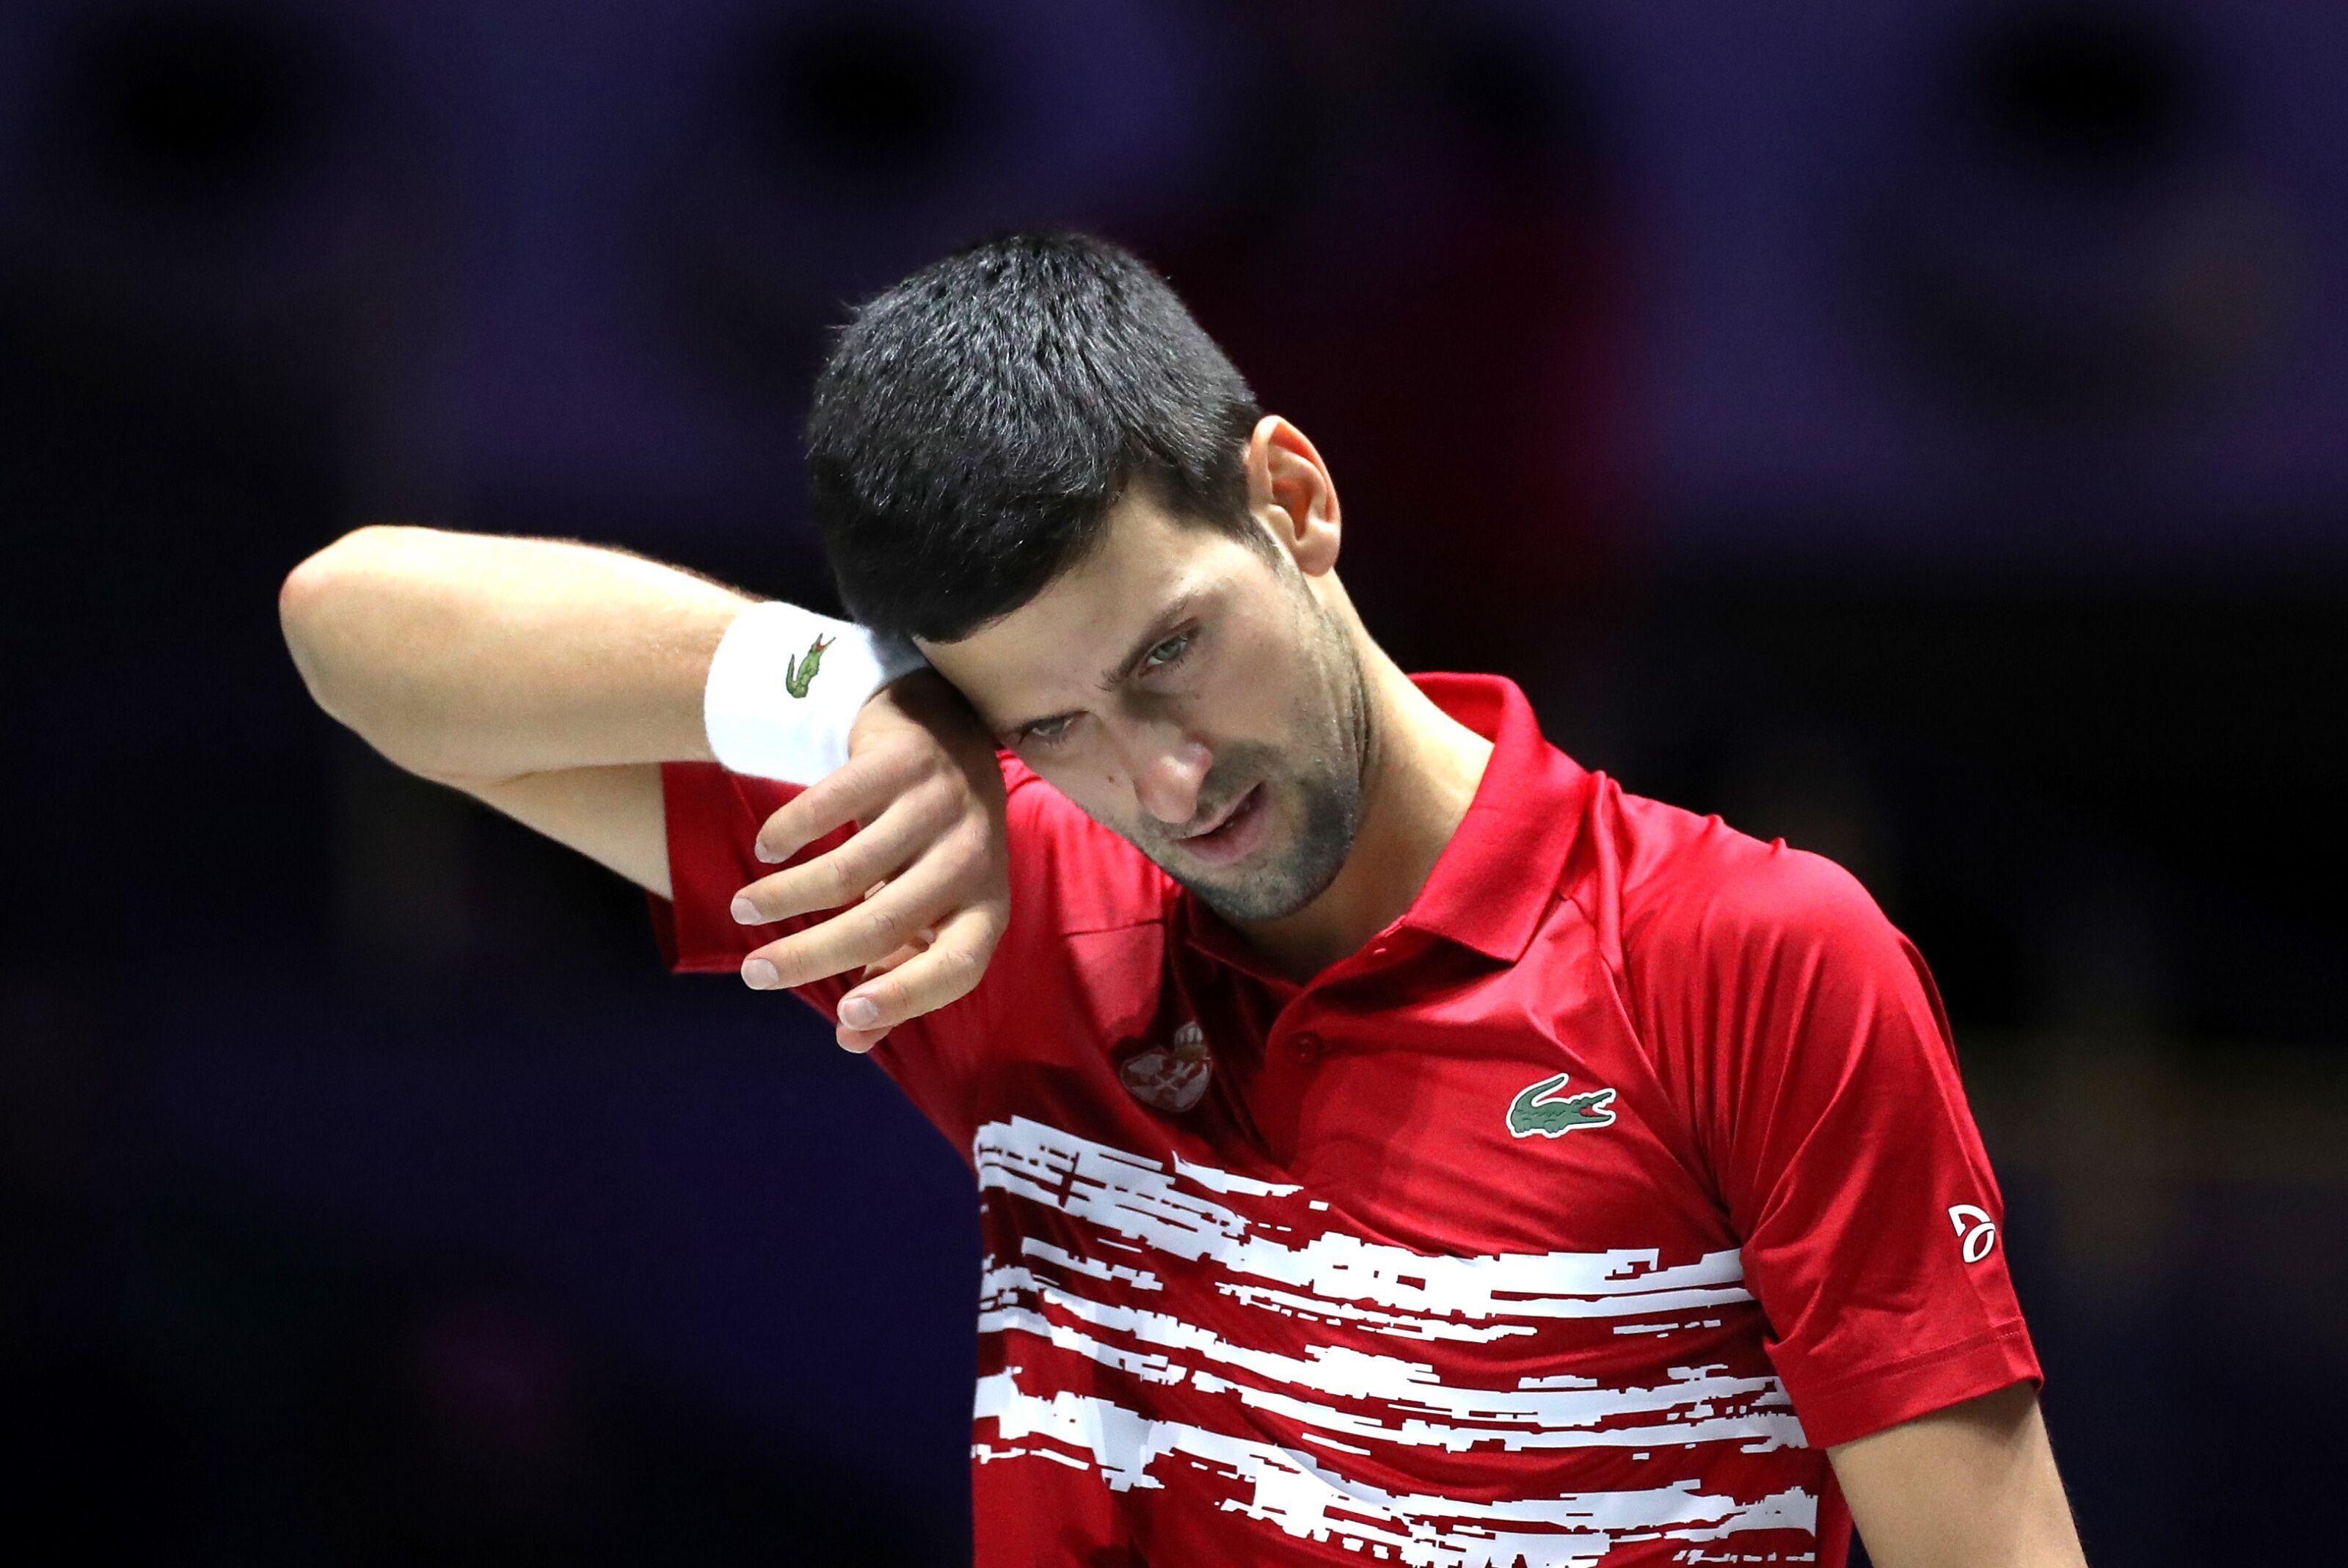 Novak Djokovic makes unusual schedule change ahead of Australian Open